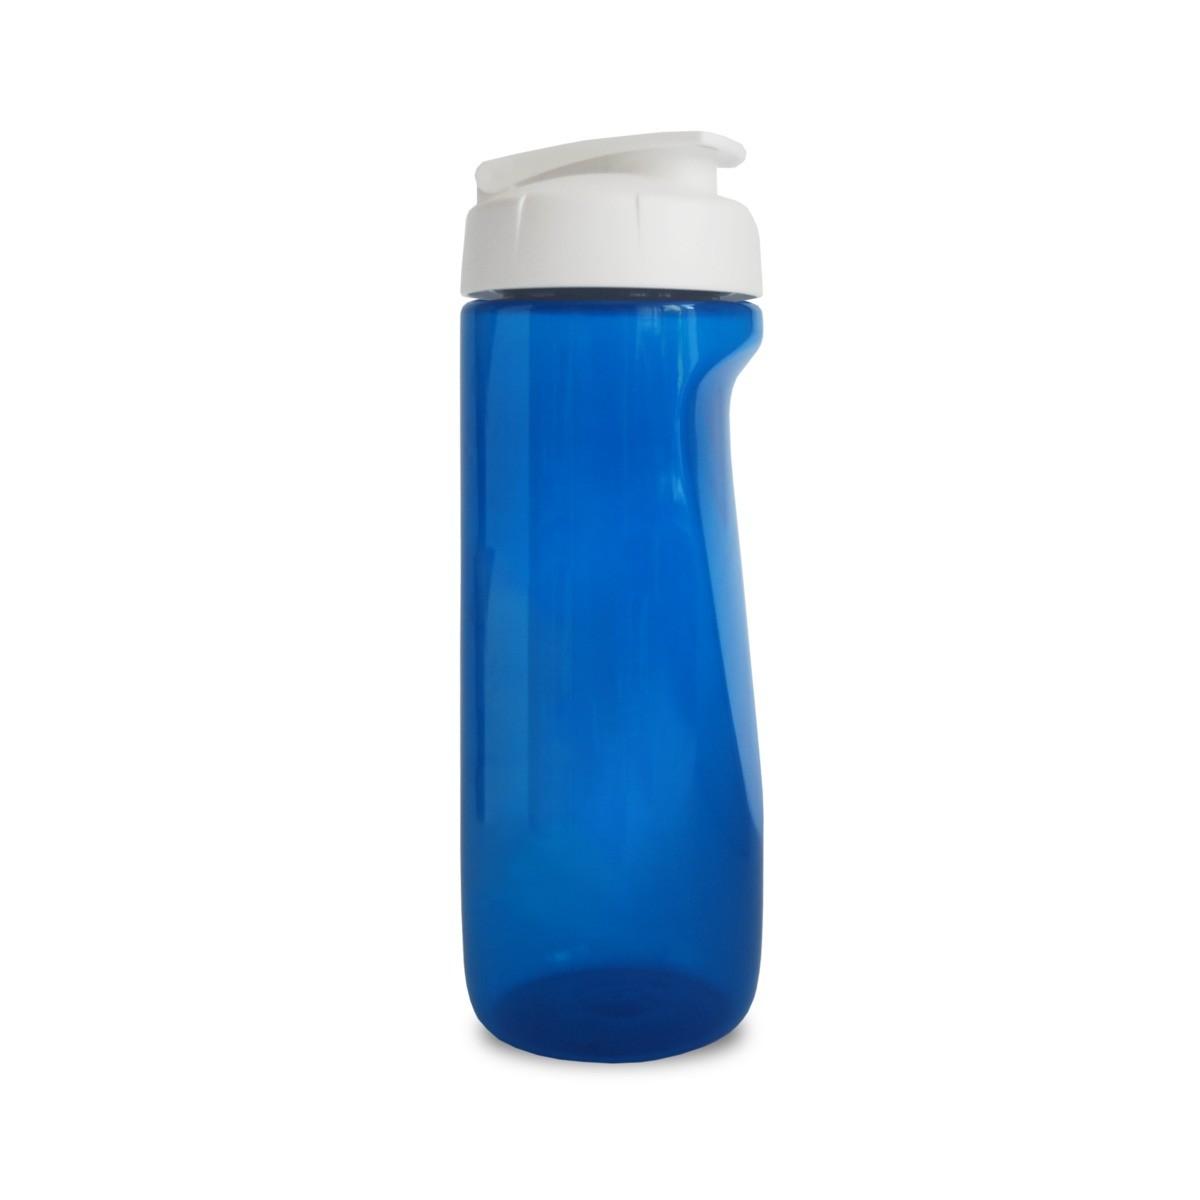 Vattenflaska Kick blå